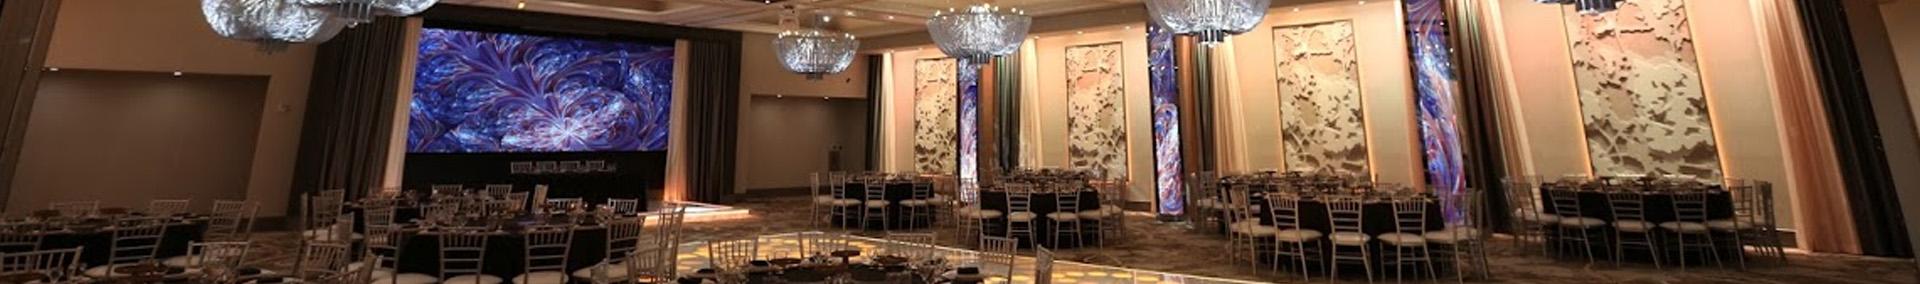 Modern Banquet Hall in Glendale CA